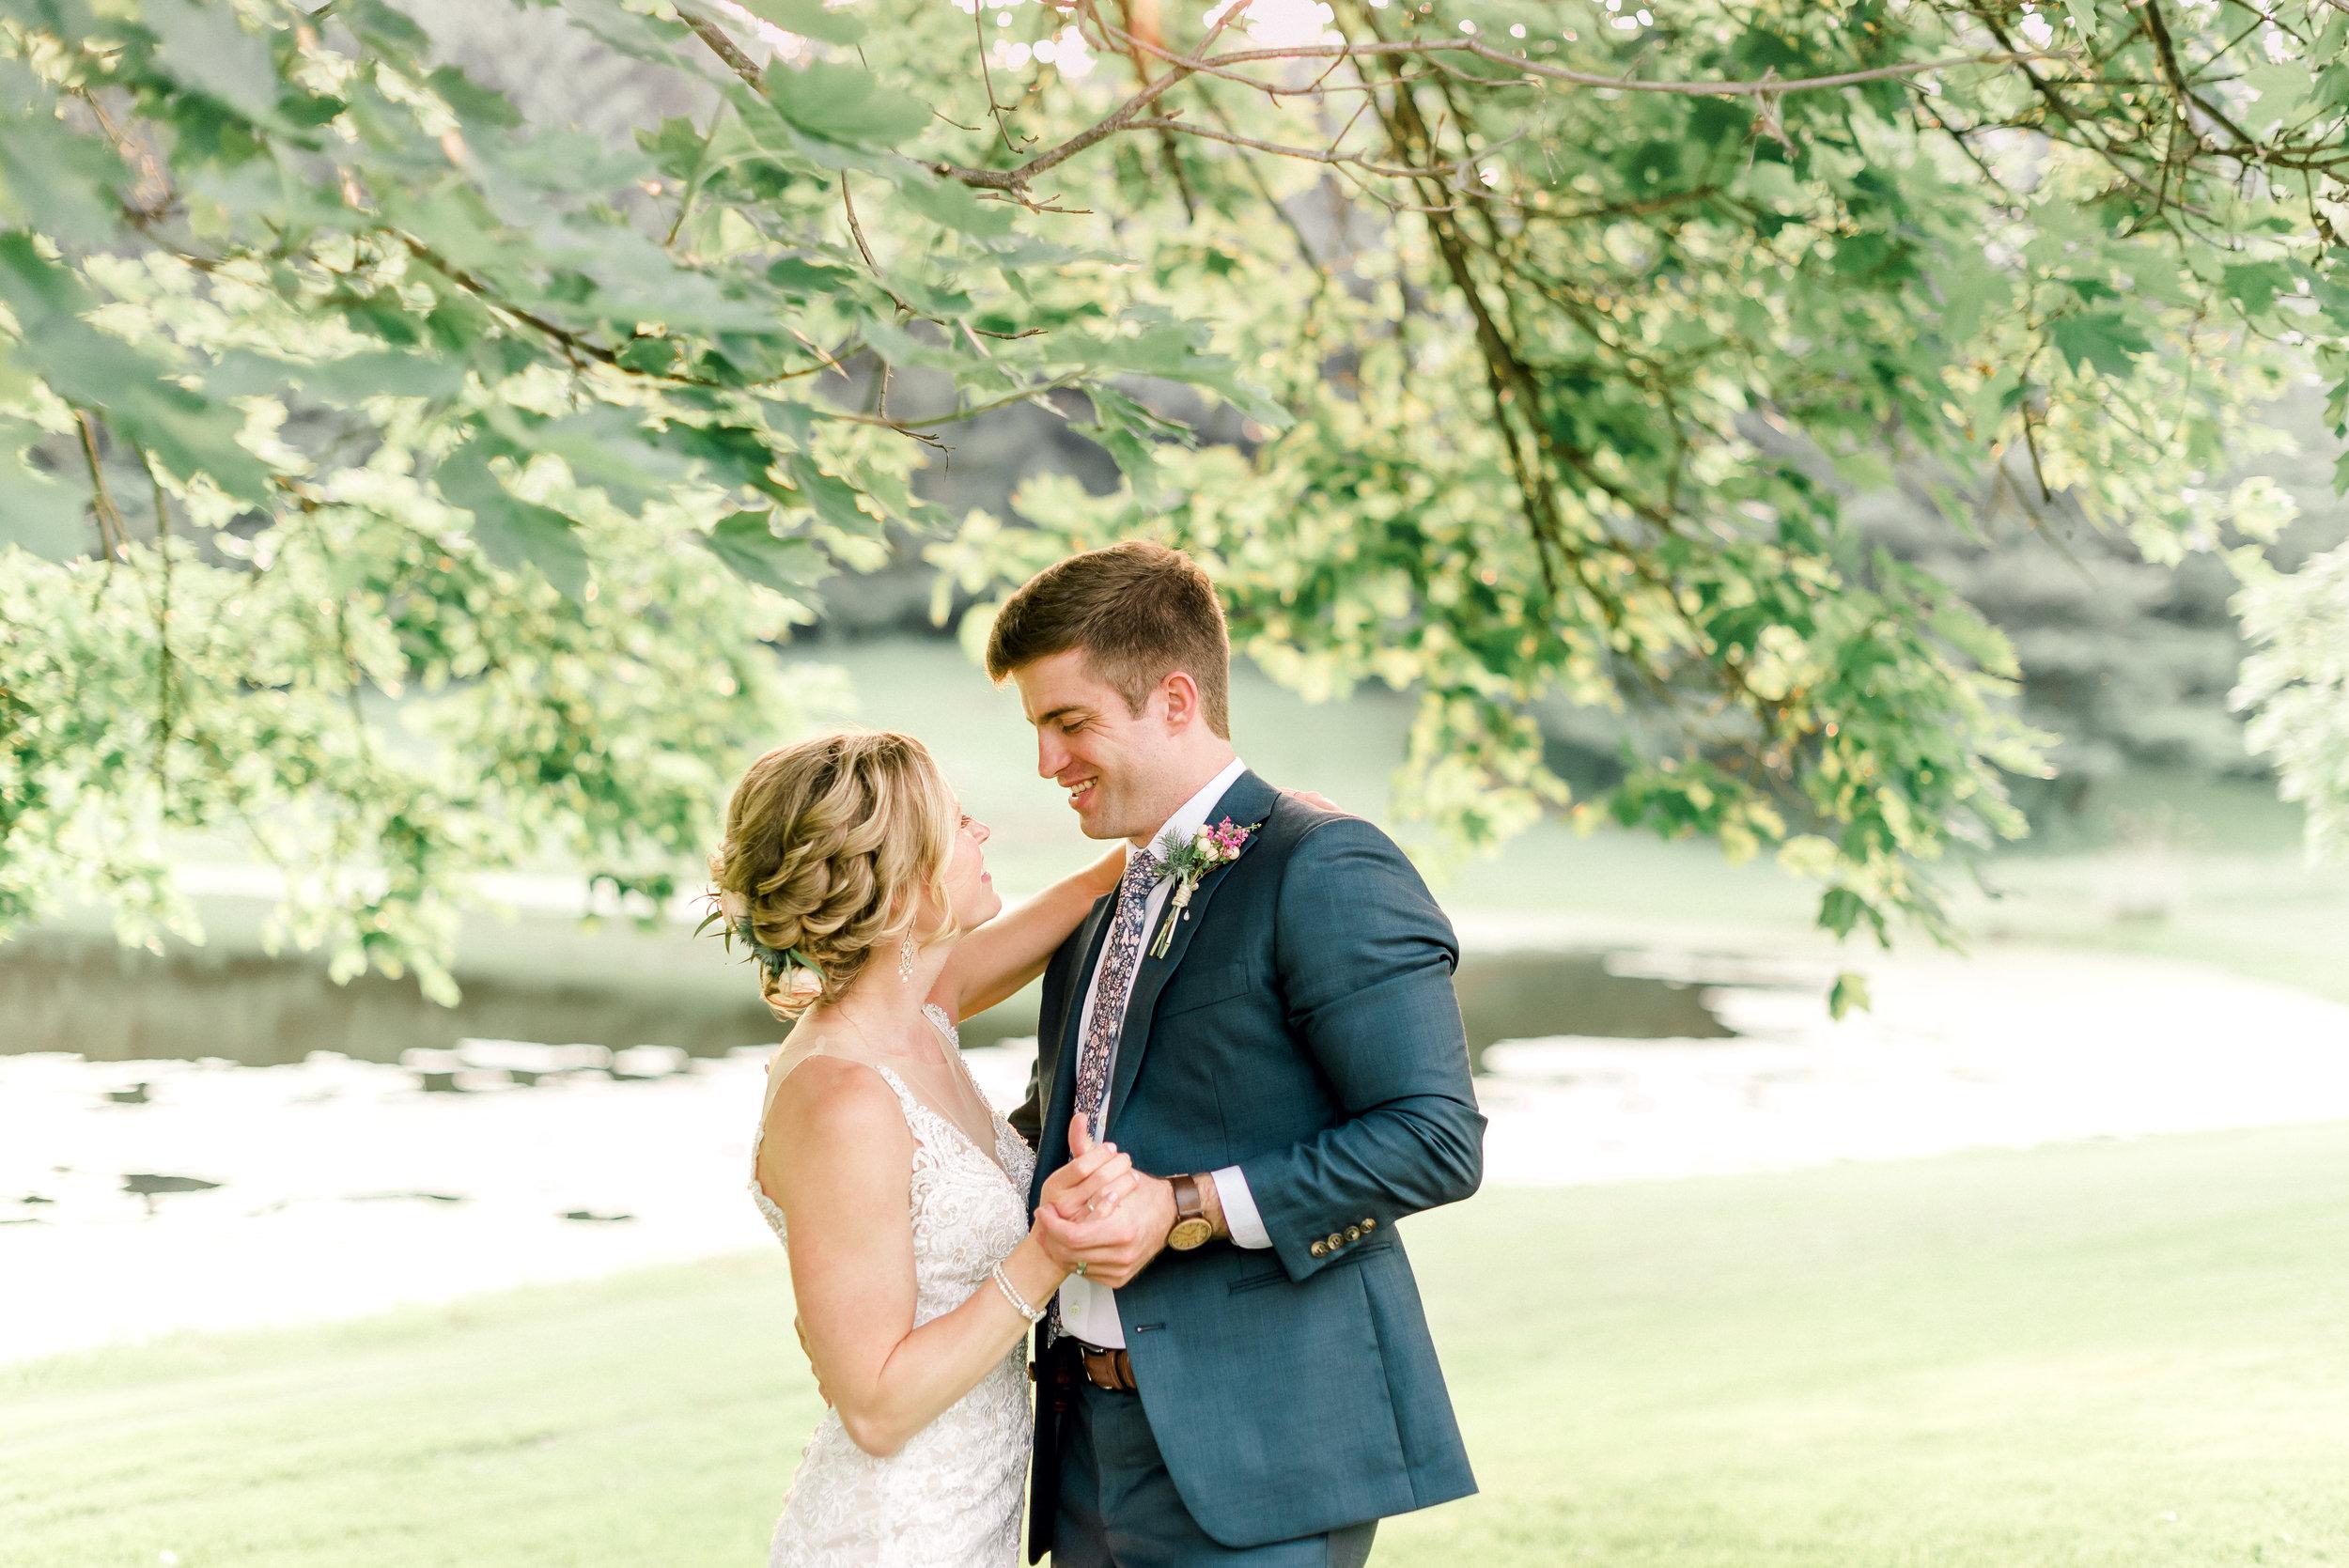 pittsburgh-wedding-photographer-shady-elms-farm-0053.jpg